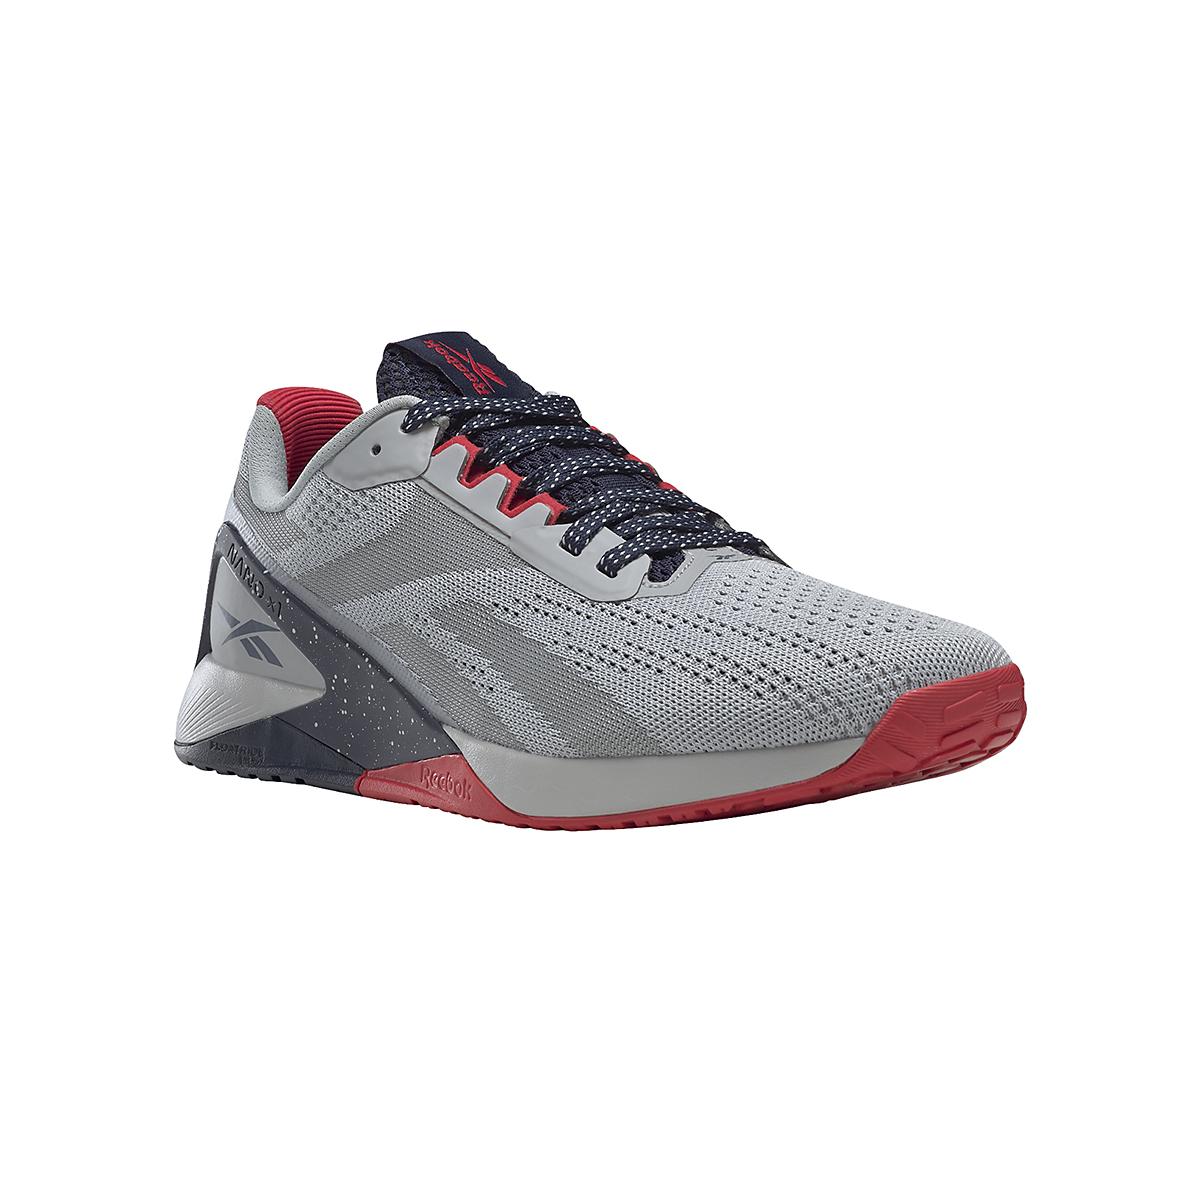 Men's Reebok Nano X1 Training Shoe - Color: Pure Grey/Vector Navy/Vector Red - JackRabbit Exclusive - Size: 8 - Width: Regular, Pure Grey/Vector Navy/Vector Red - JackRabbit Exclusive, large, image 5